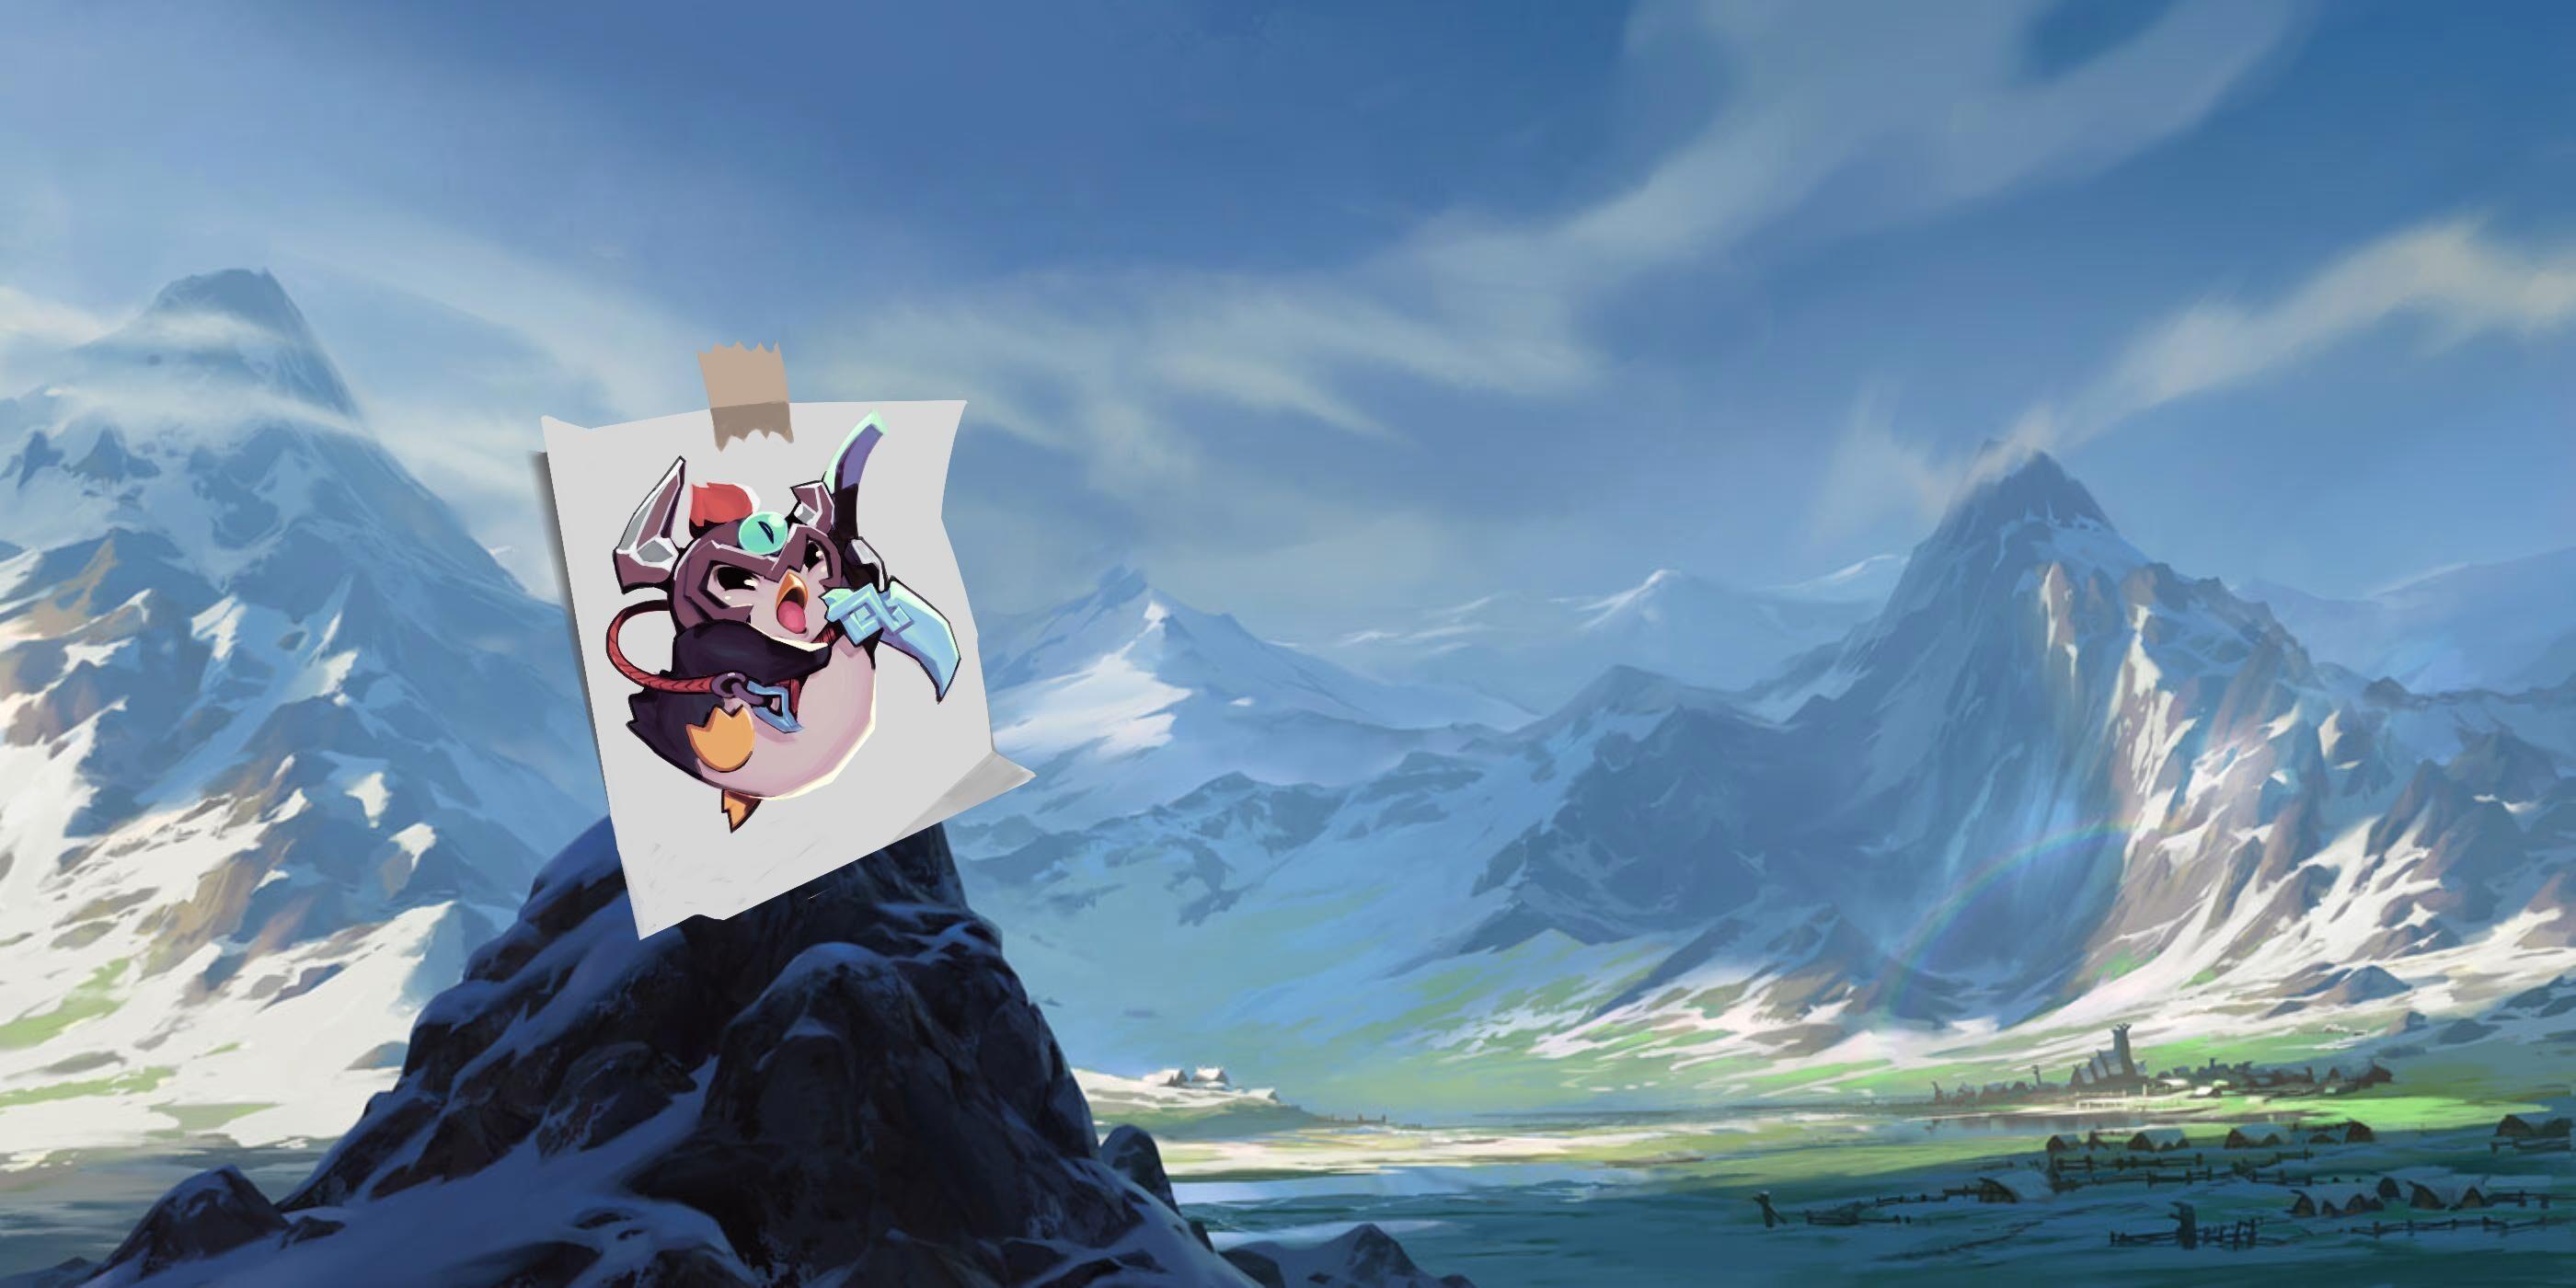 Pingu OriginalSkin.jpg